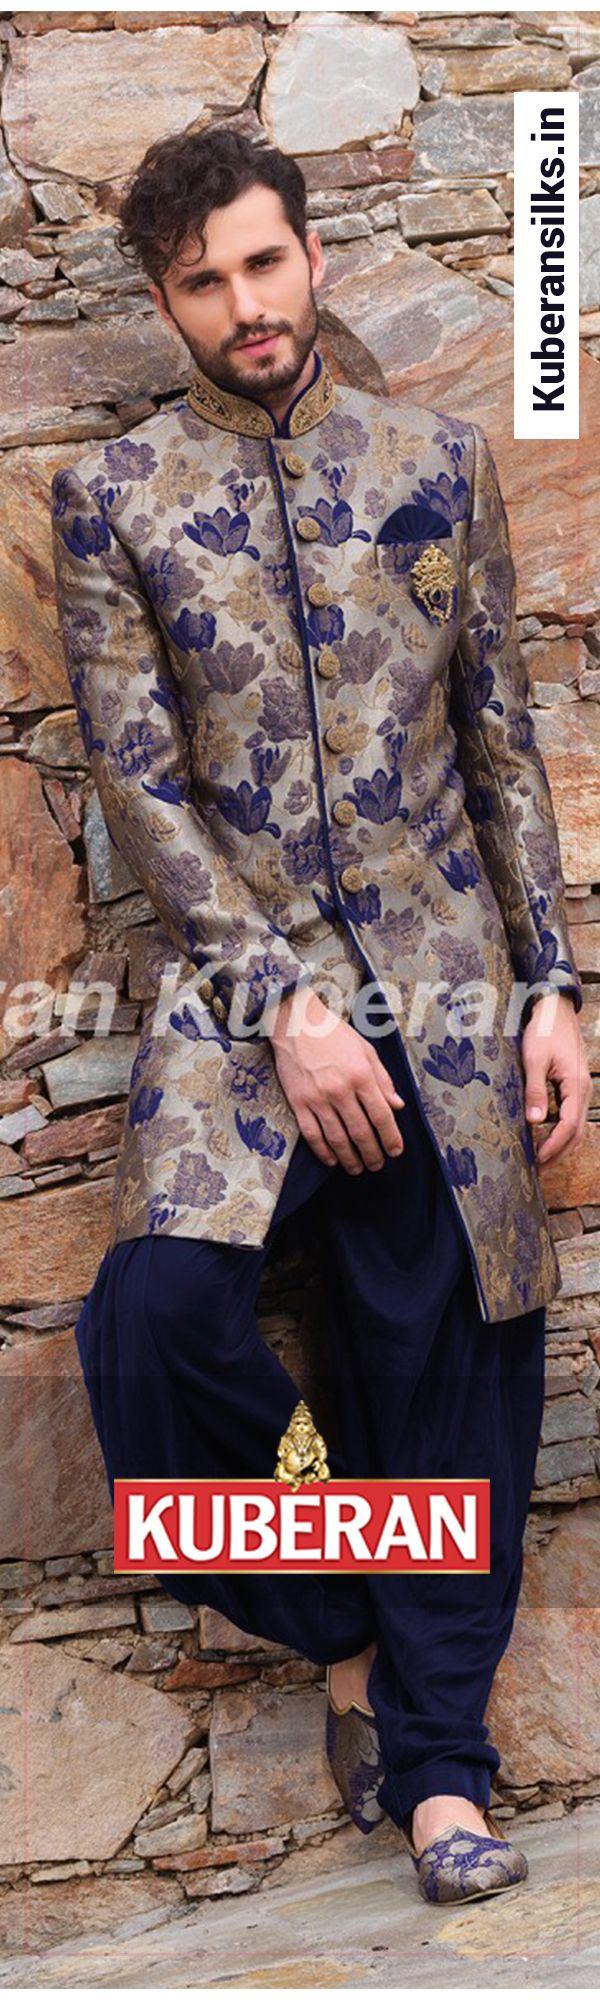 Kuberan Royal Blue Sherwani #bluesherwani #royalsherwani #kuberansherwani #lovely #weddingsherwani #menssherwani #sherwanionline #indianwear #ethnicfashion #fashion #shoponline #designersherwani